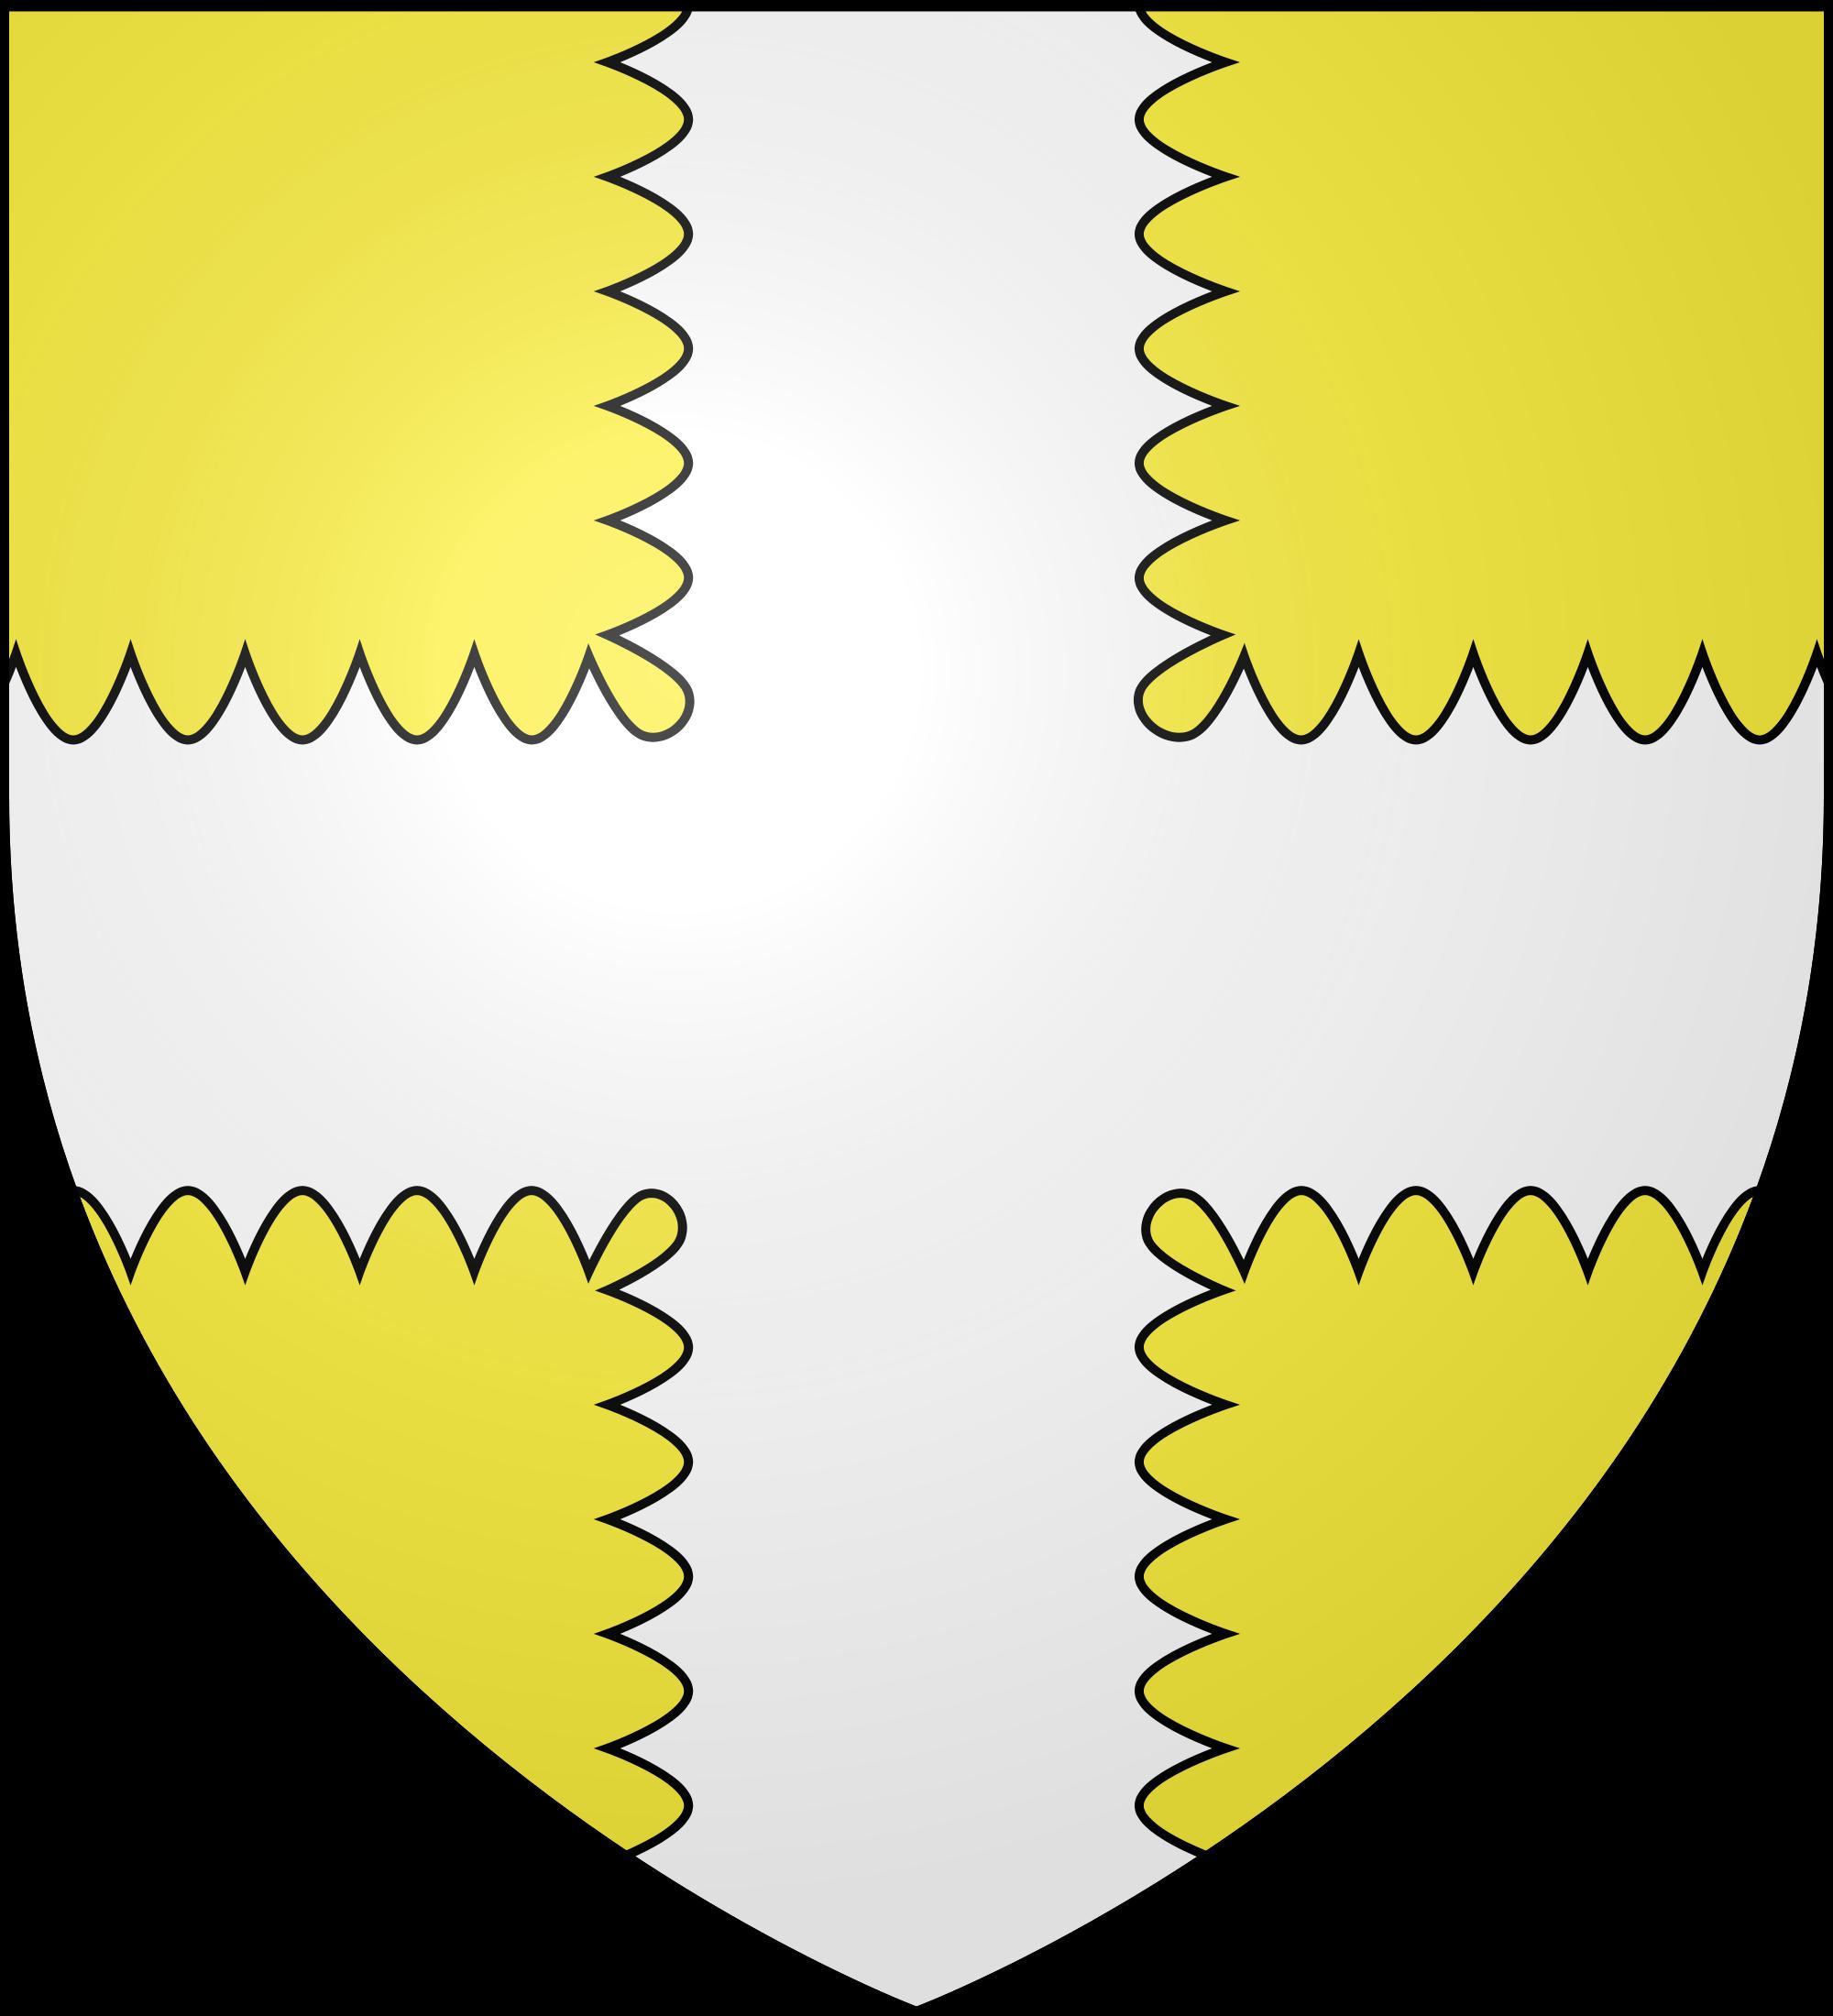 File:Blason ville fr Saône (Doubs).svg.